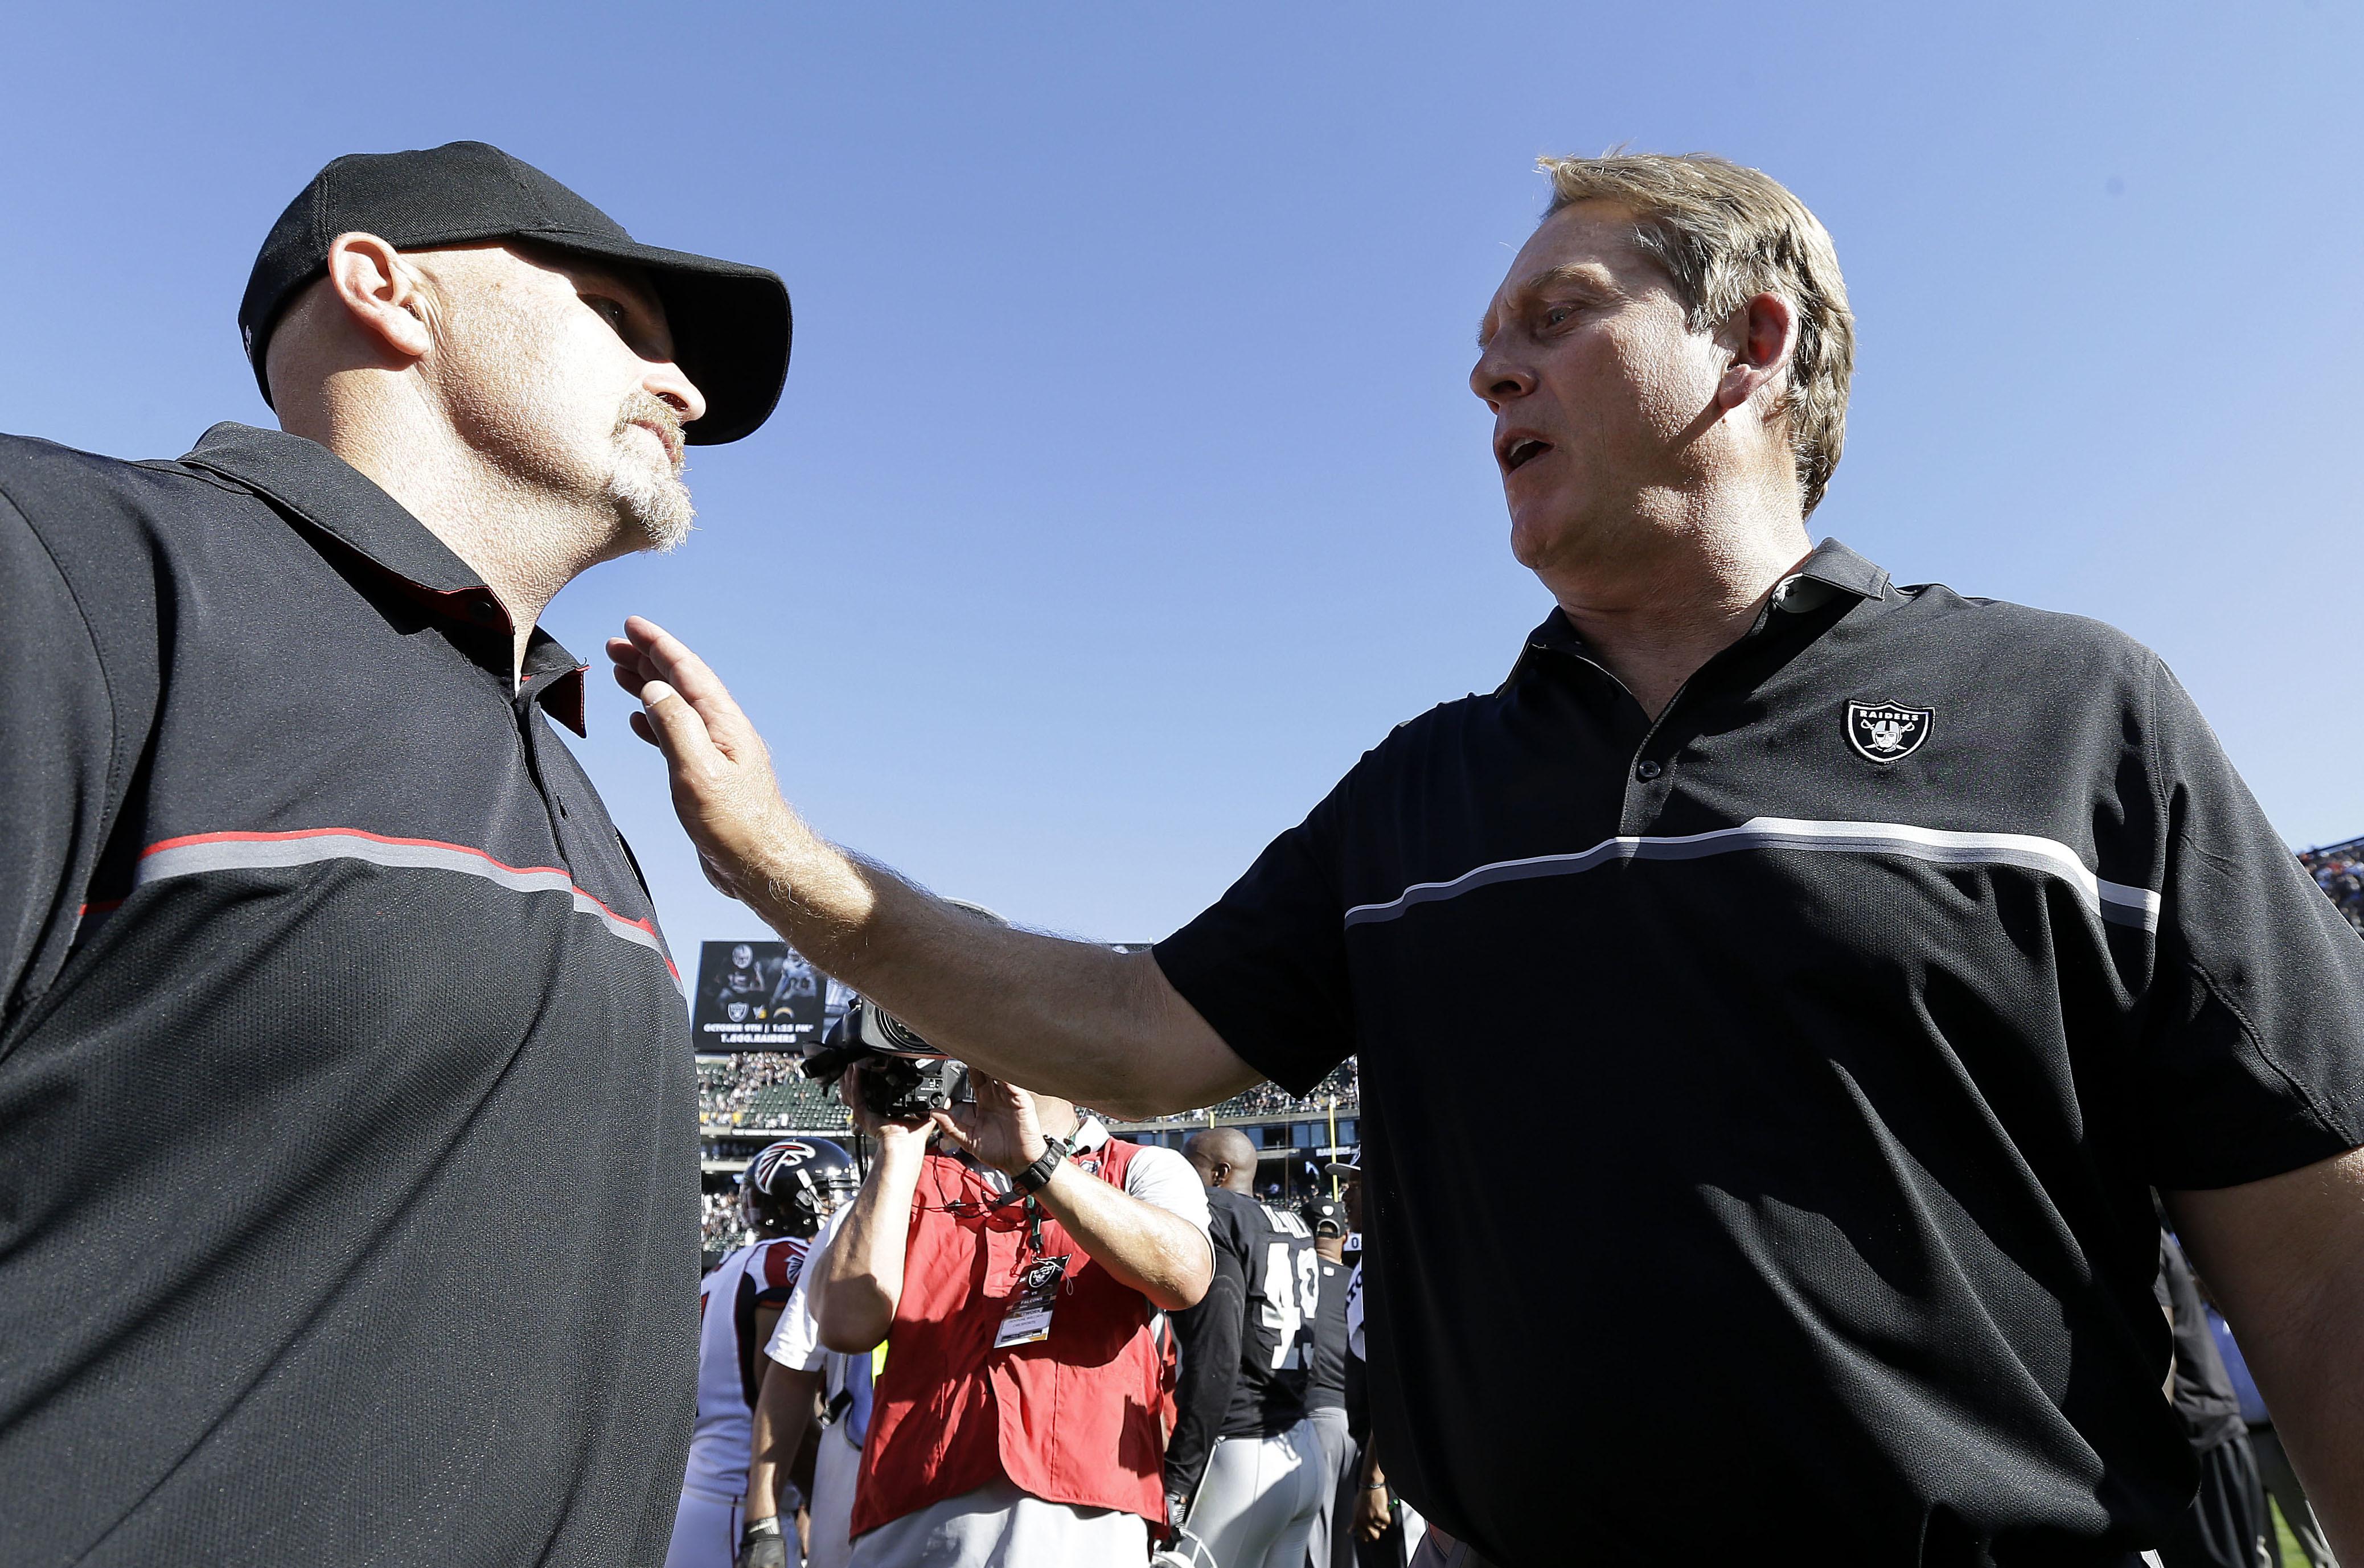 Atlanta Falcons head coach Dan Quinn, left, greets Oakland Raiders head coach Jack Del Rio after an NFL football game in Oakland, Calif., Sunday, Sept. 18, 2016. The Falcons won 35-28. (AP Photo/Ben Margot)